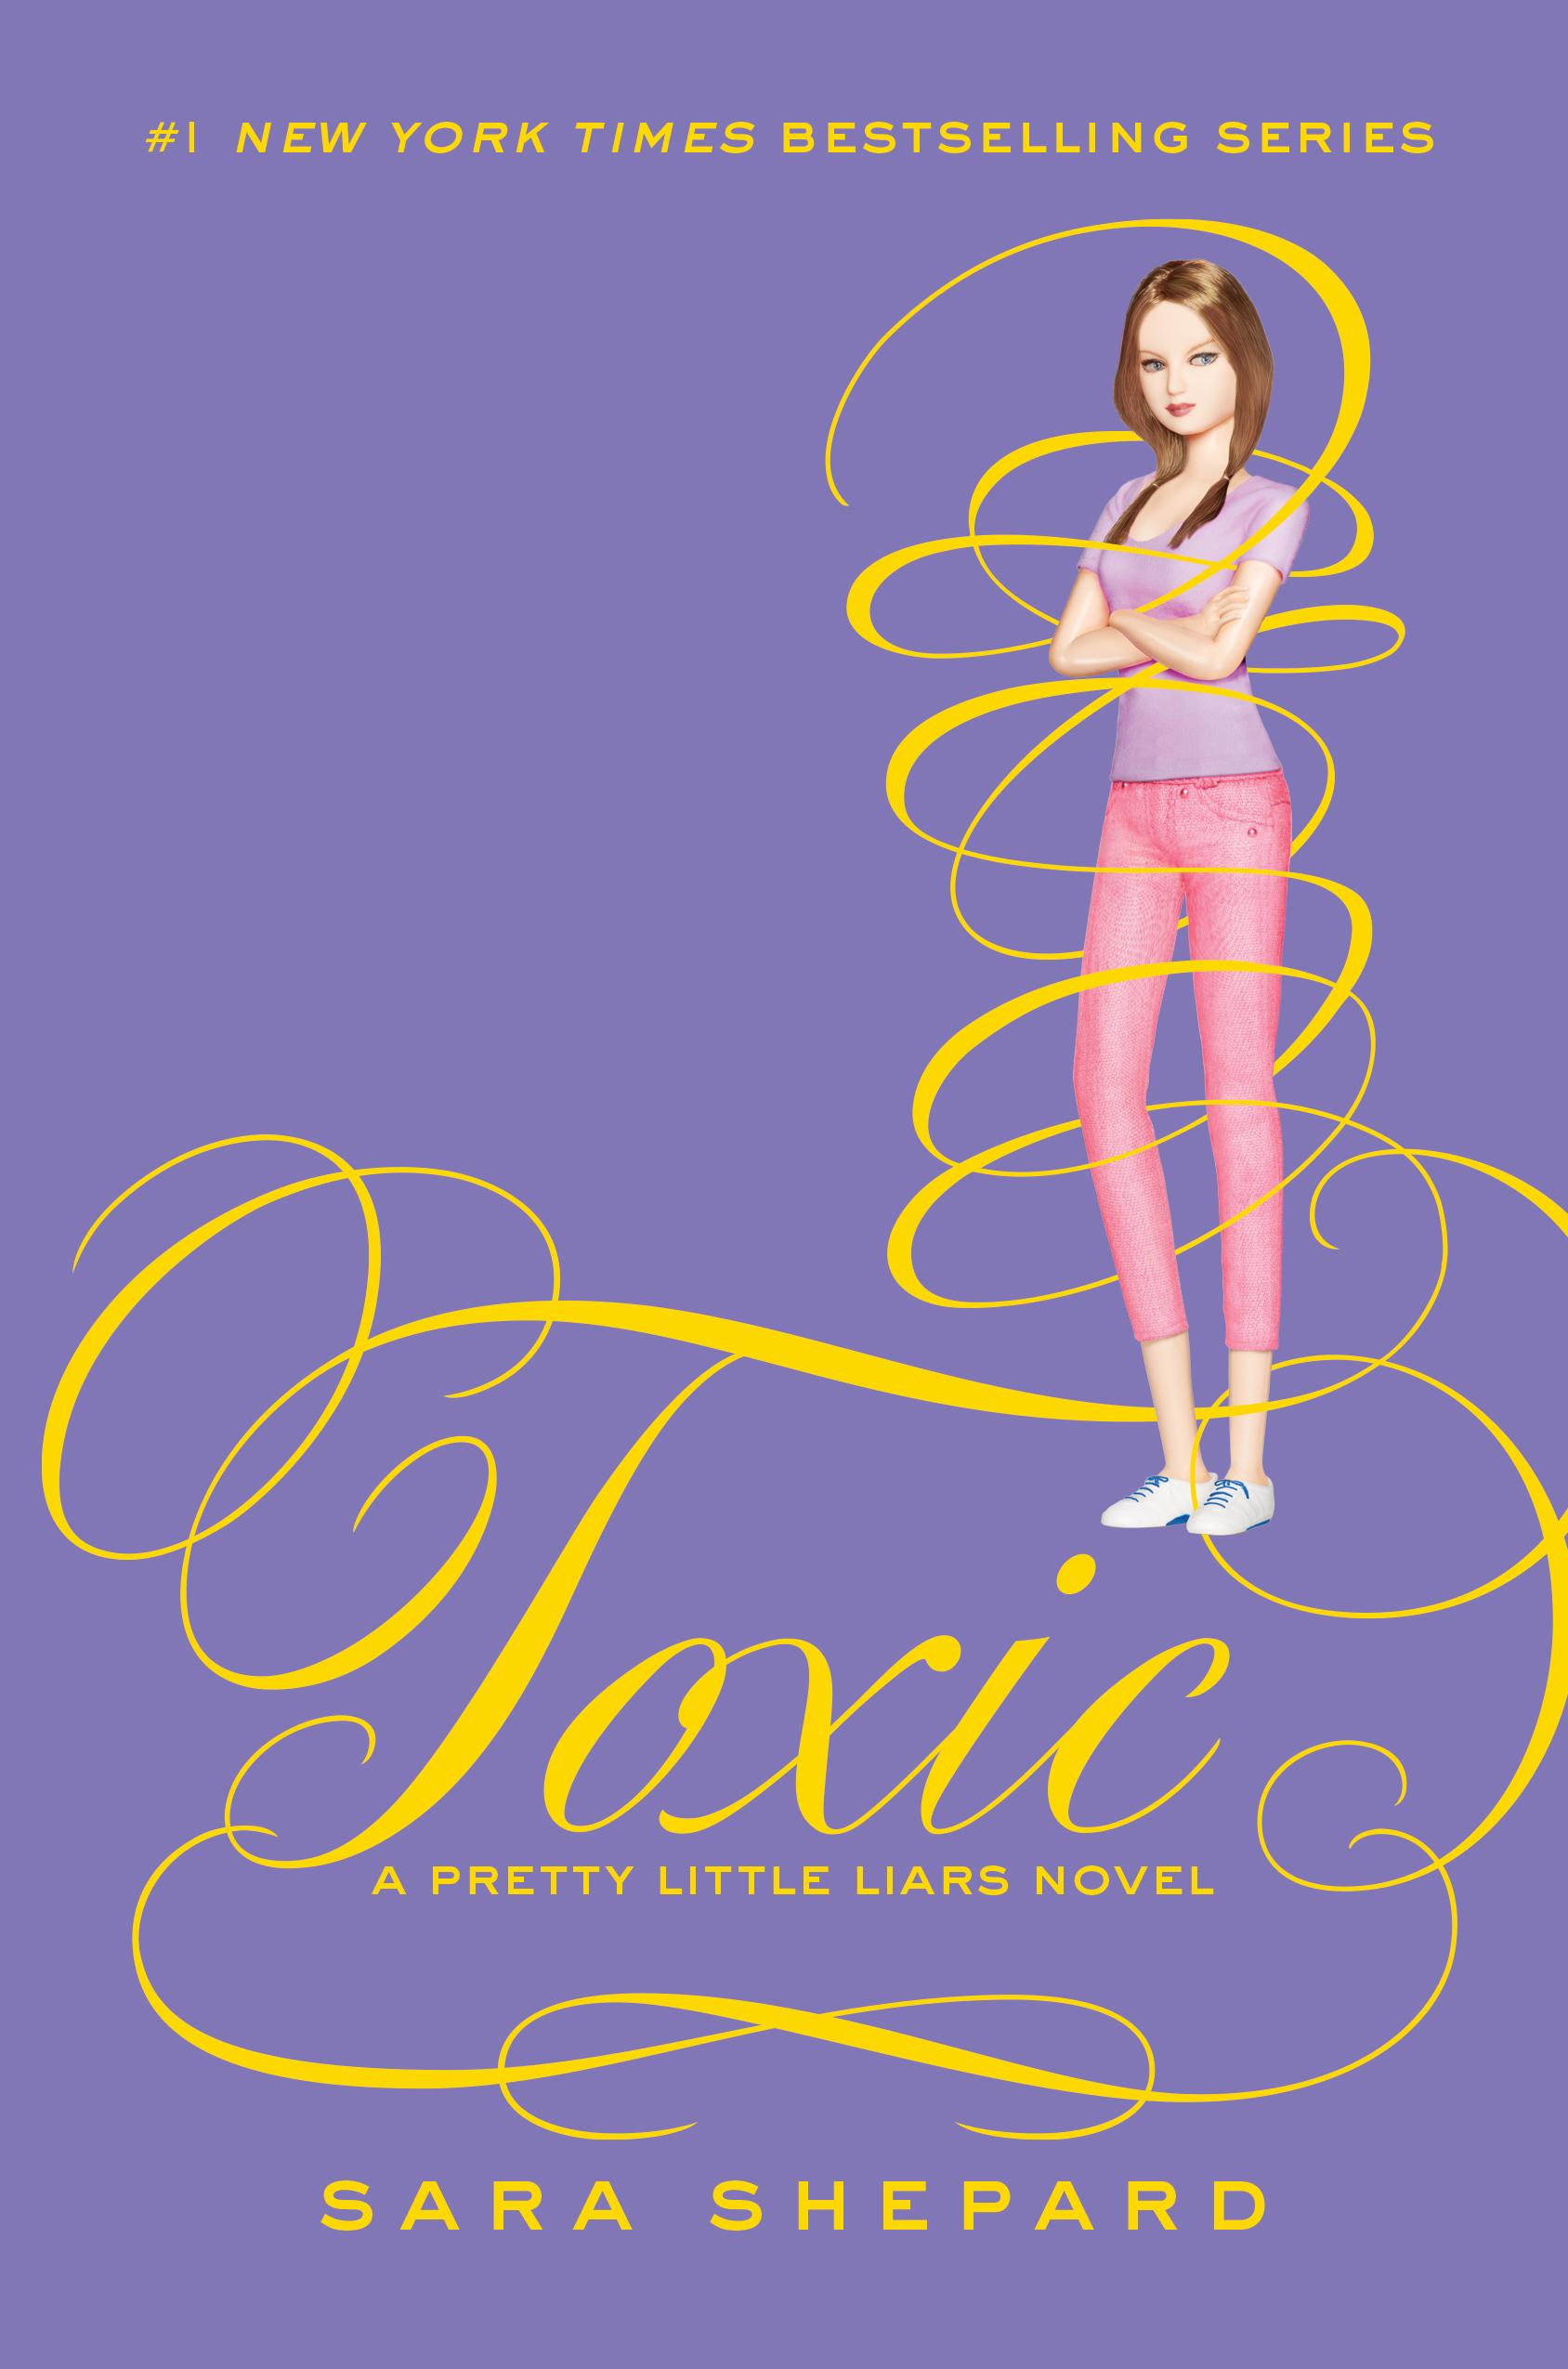 Pretty Little Liars Book Cover : Toxic pretty little liars wiki fandom powered by wikia